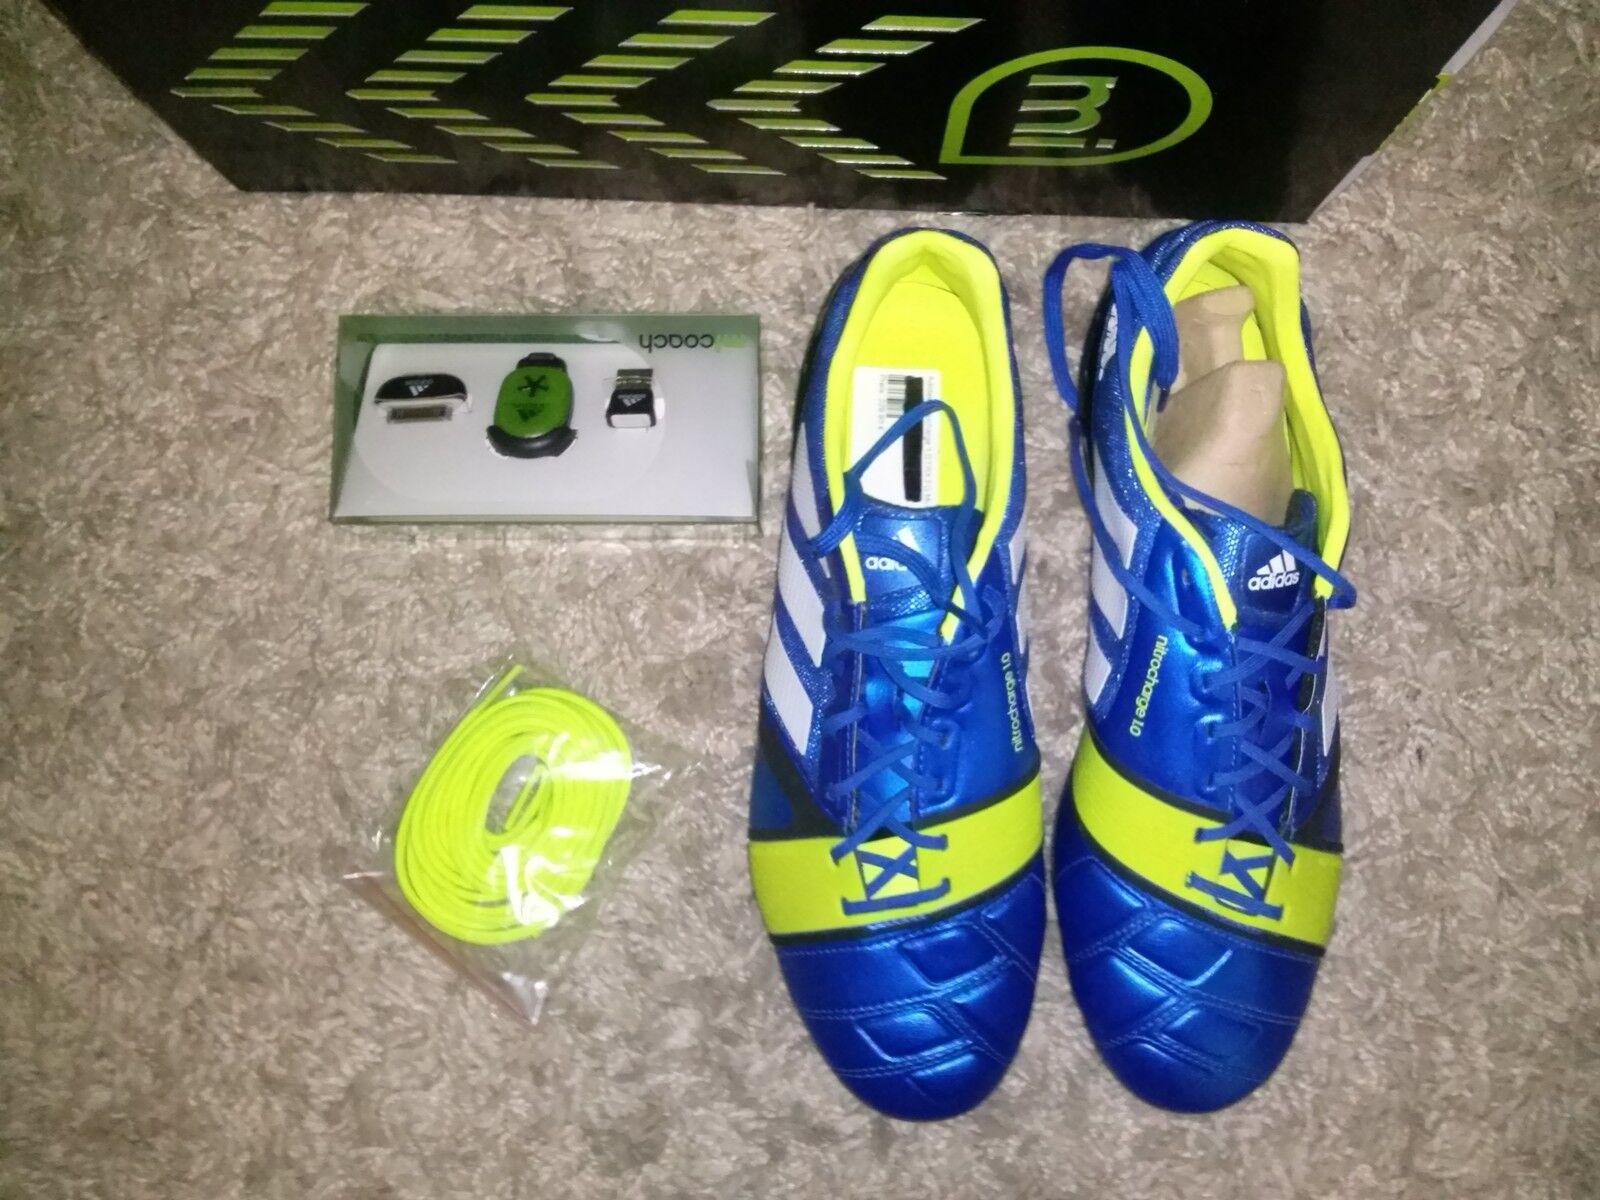 Adidas nitrocharge 1.0 TRX  FG mit MI-COAD 41 1 3 Fußballschuh NEU